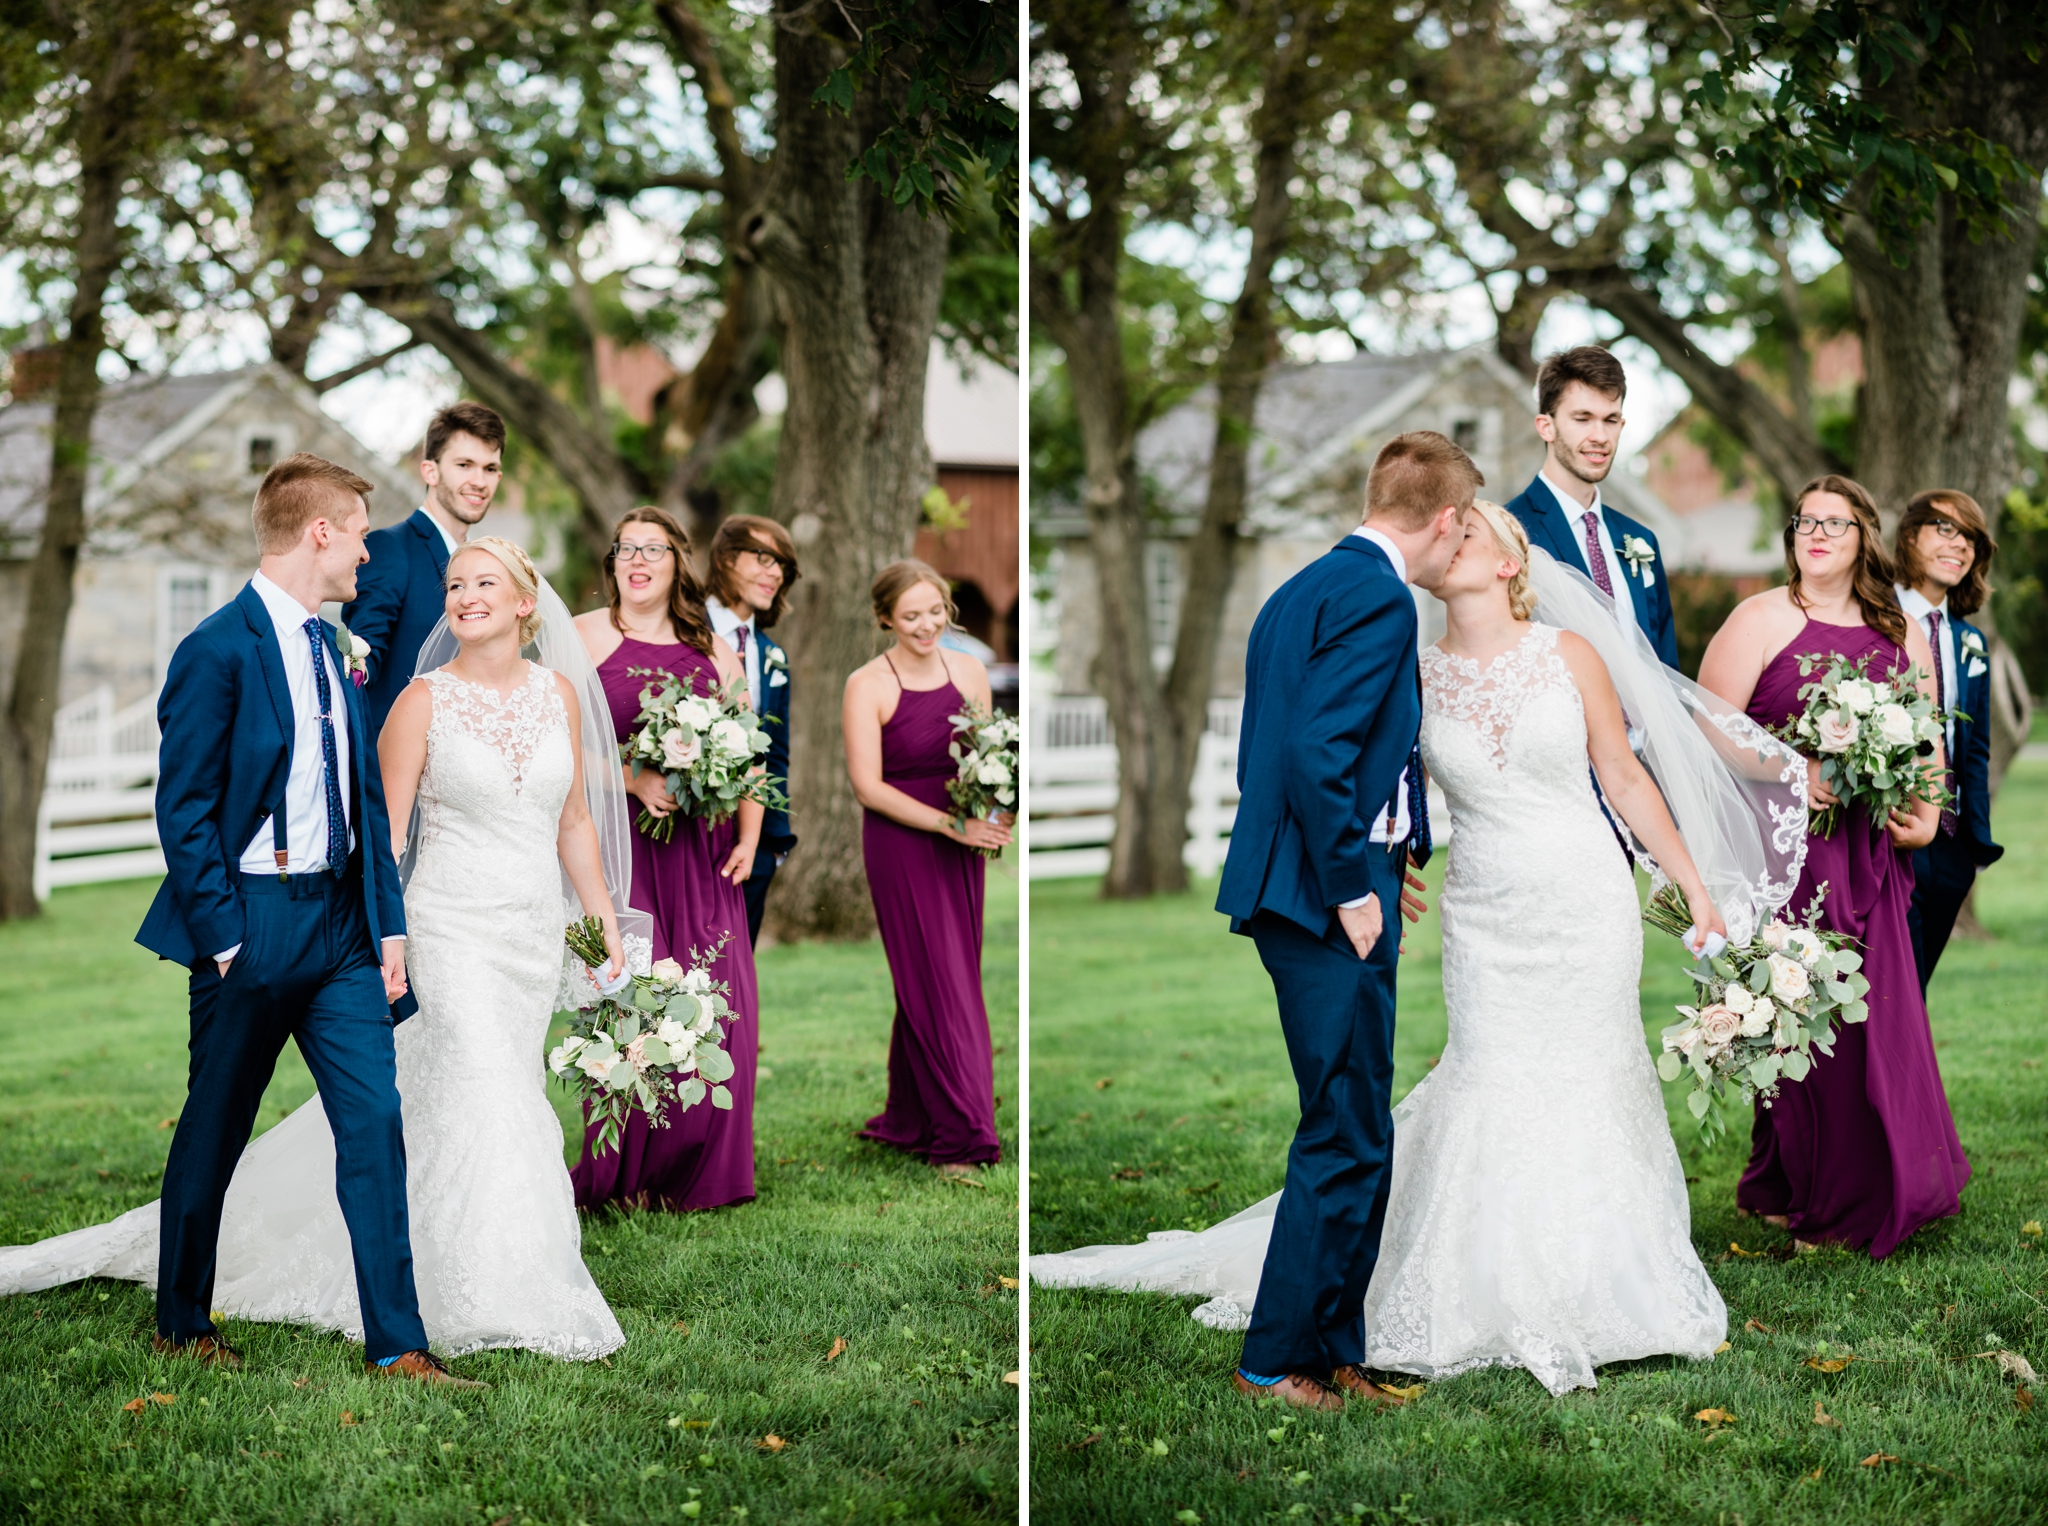 Emily Grace Photography, Lancaster PA Wedding Photographer, Wedding Photography for Unique Couples, The Barn at Silverstone, Lancaster PA Wedding Venue, The Barn at Silverstone Bridal Party Photos